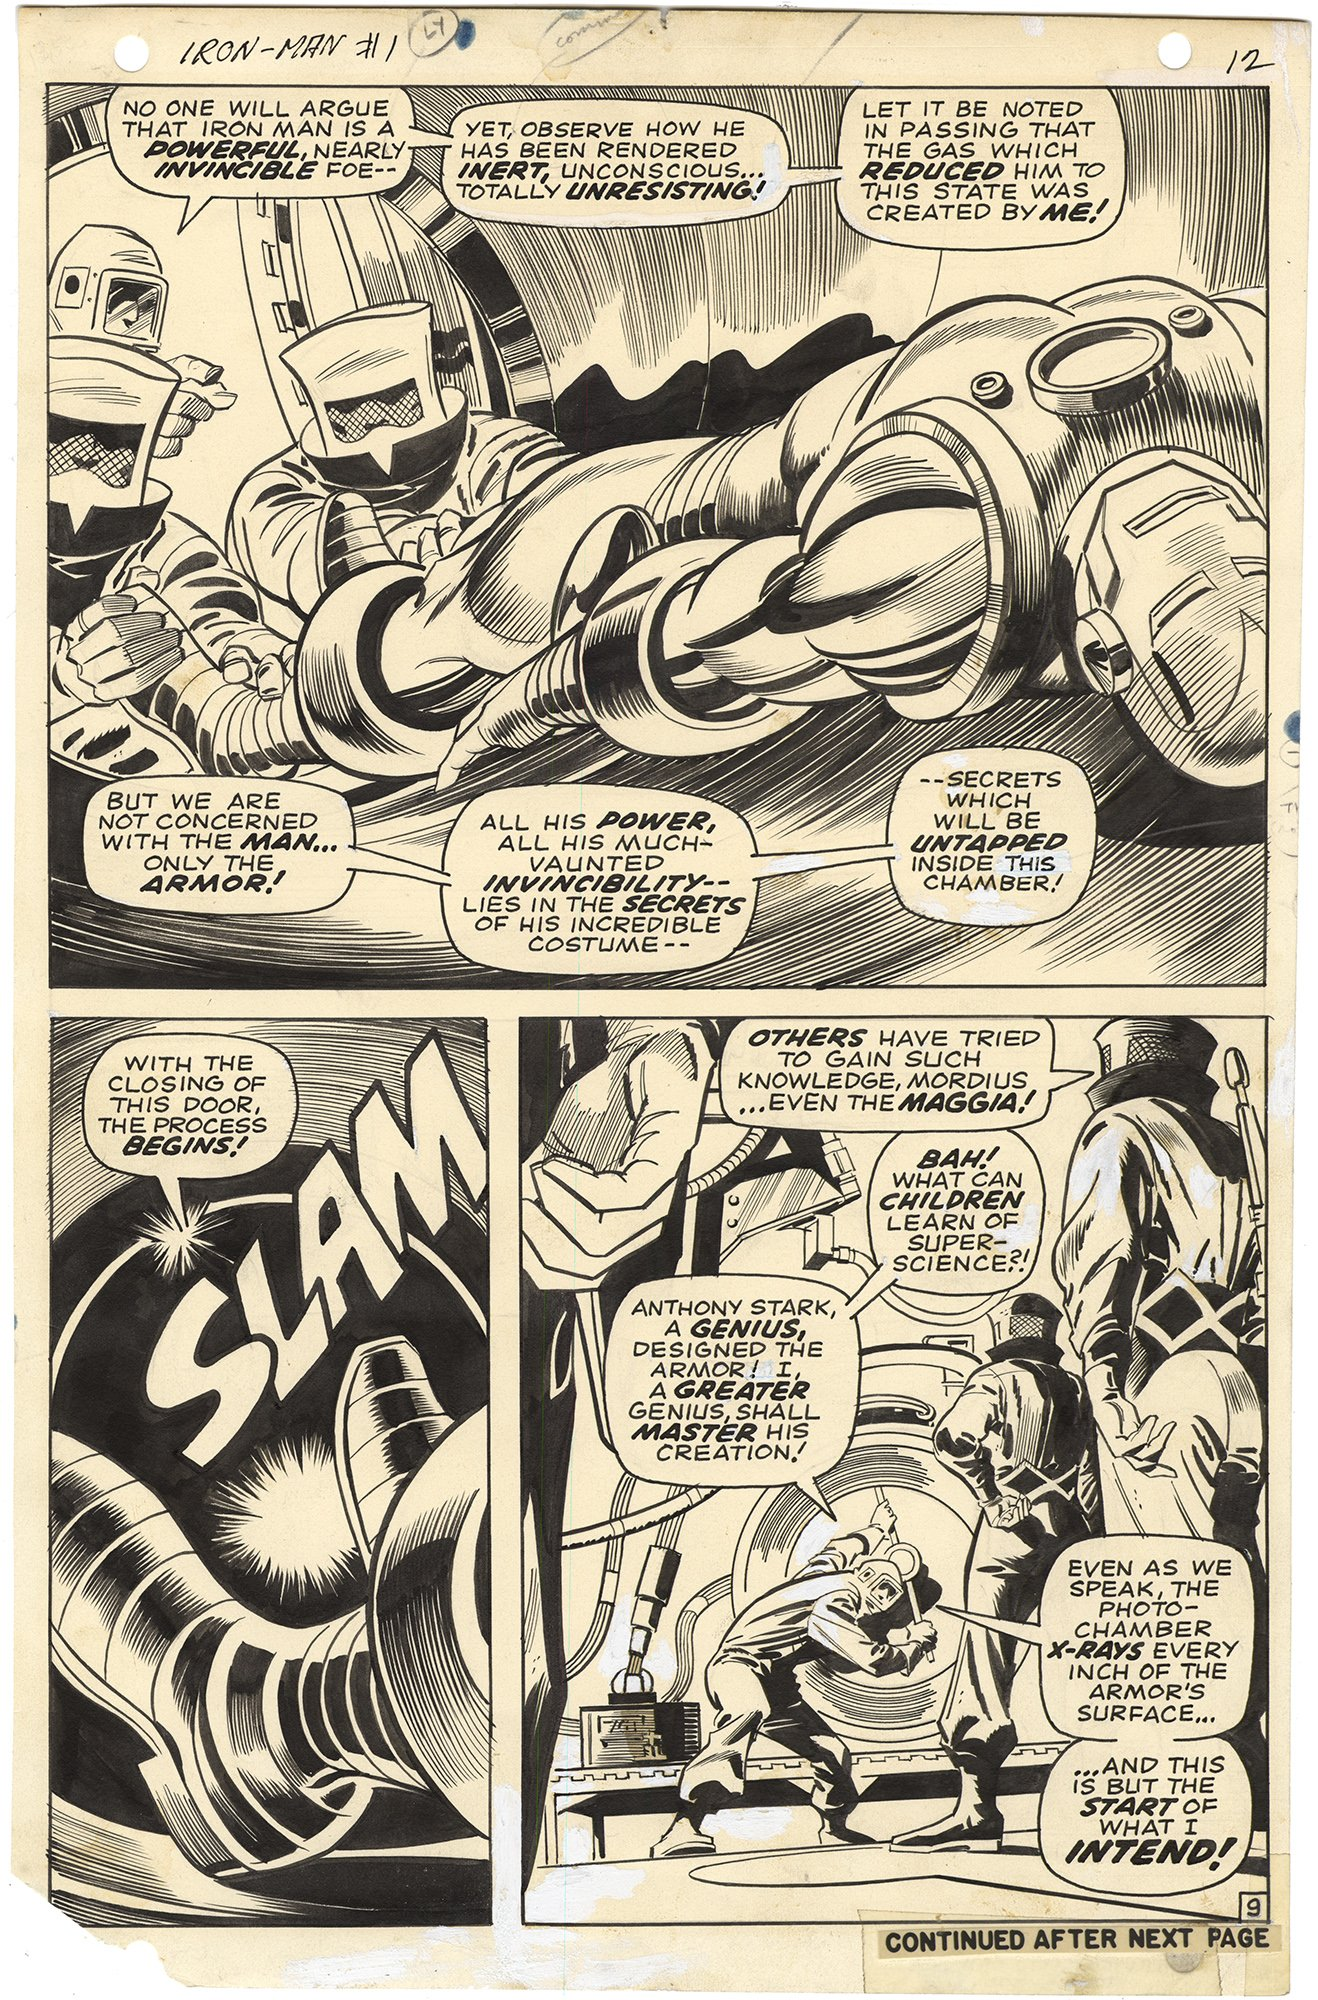 Iron Man #1 p9